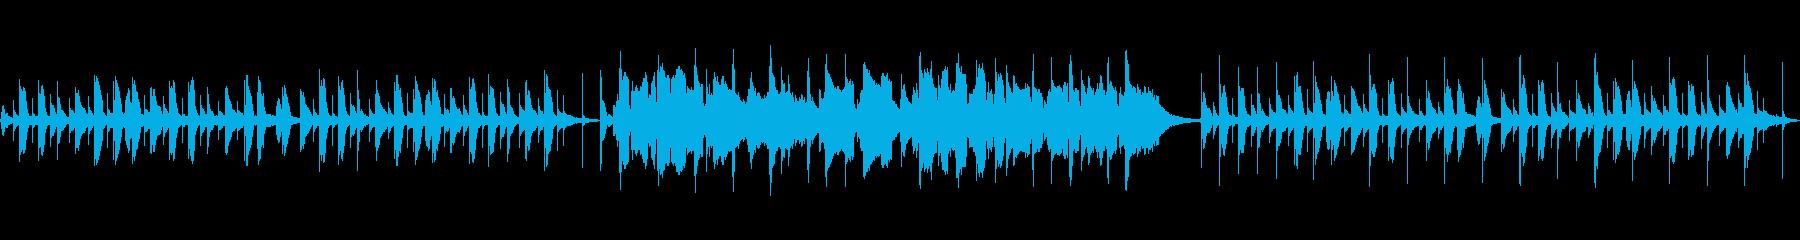 Cartoon 木琴 クラリネット...の再生済みの波形